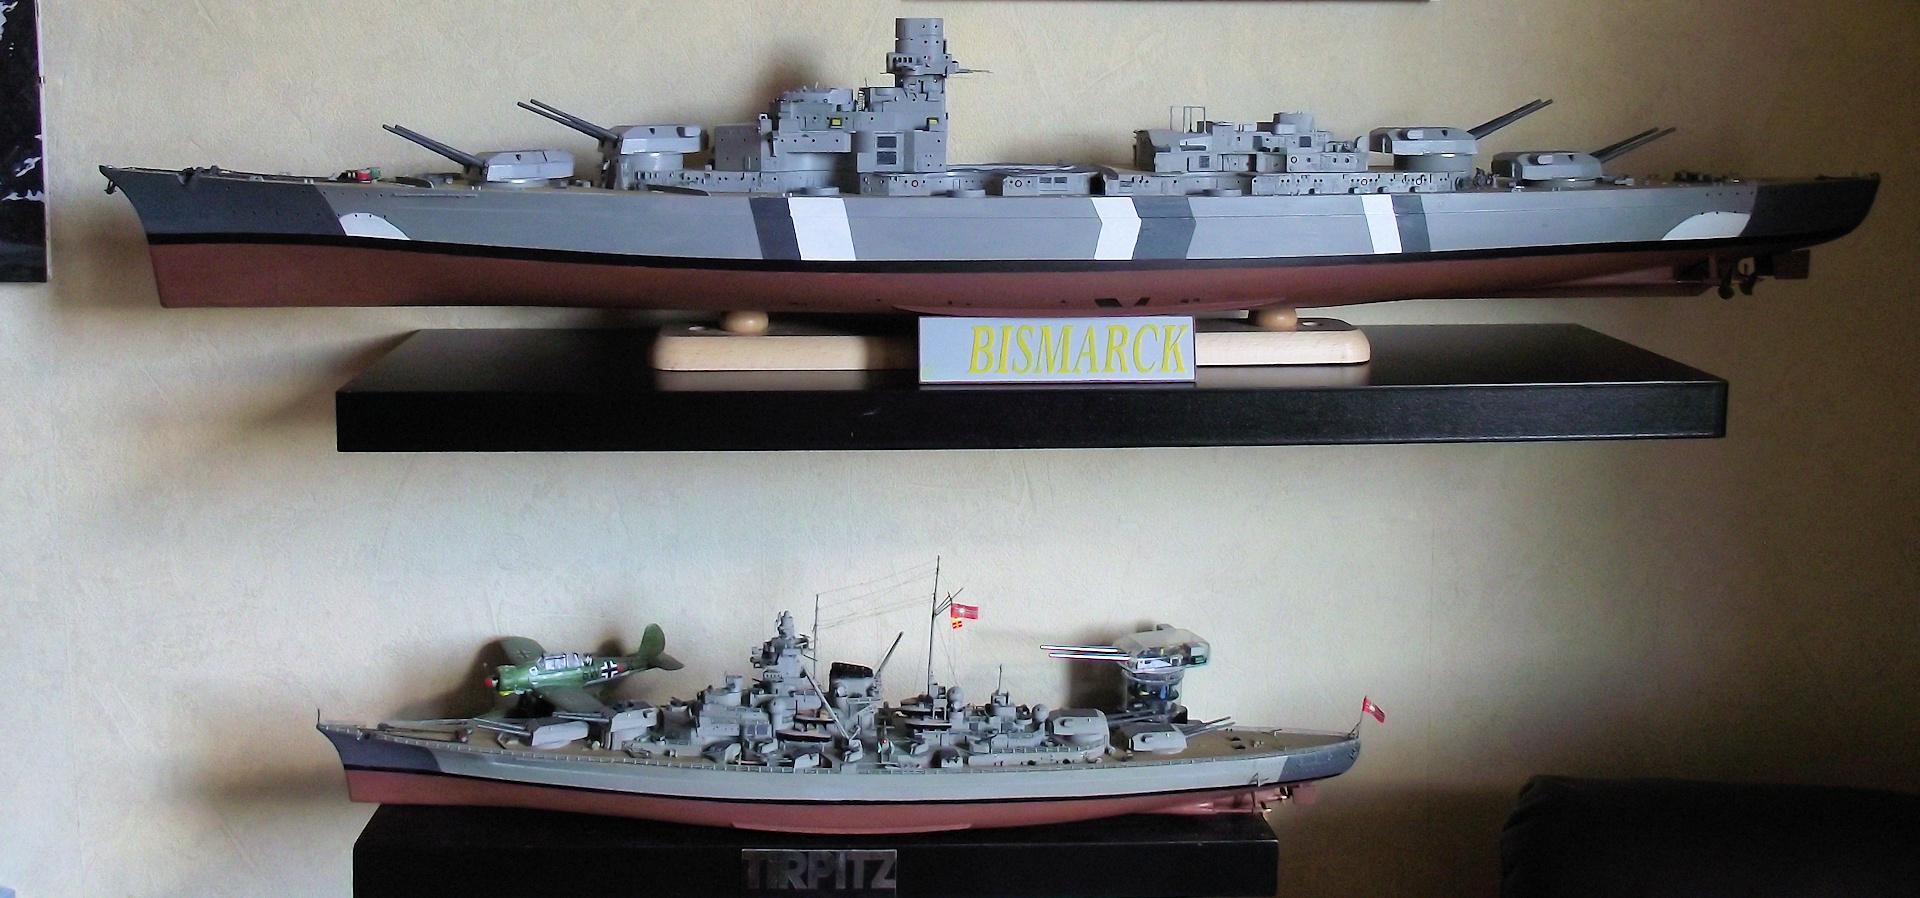 Bismarck 1/200 Trumpeter - Page 3 680050Bismarck1x20051